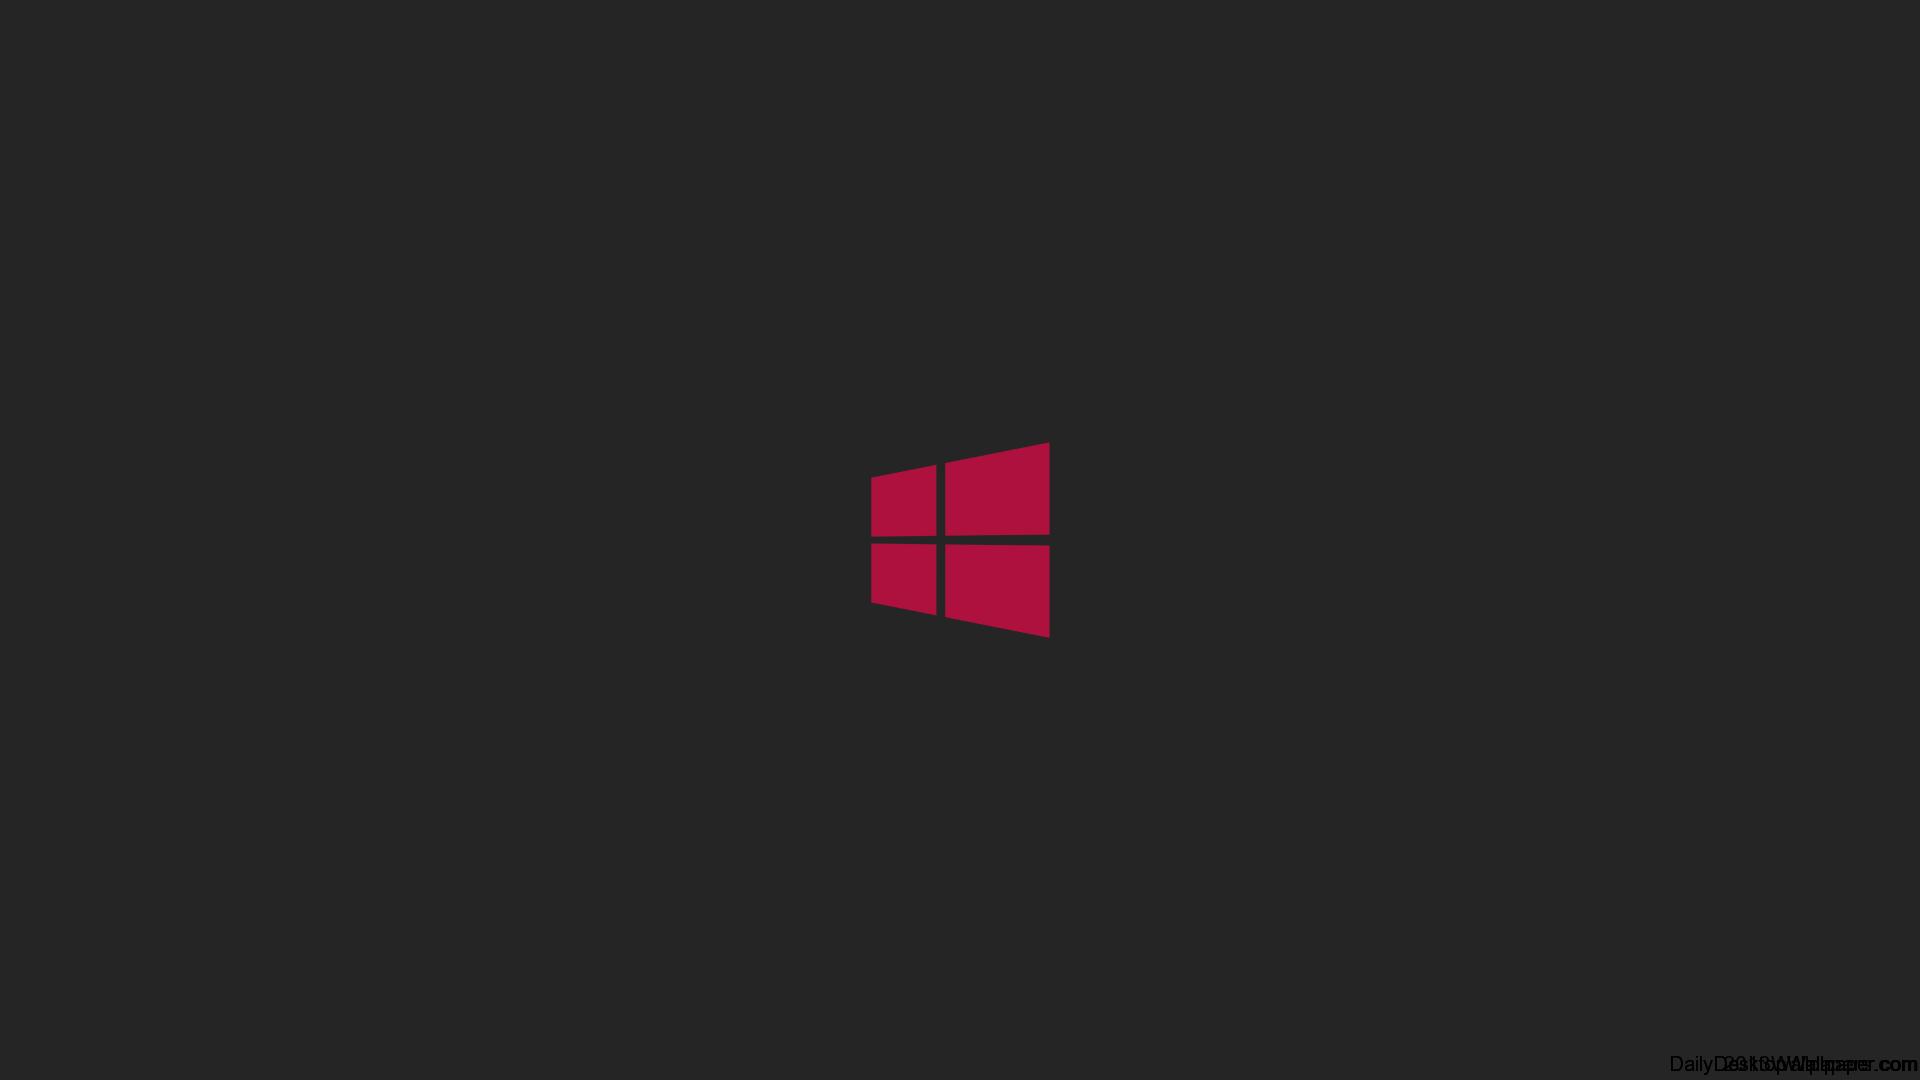 Purple Windows 8 Logo Wallpaper wallpaper   964030 1920x1080